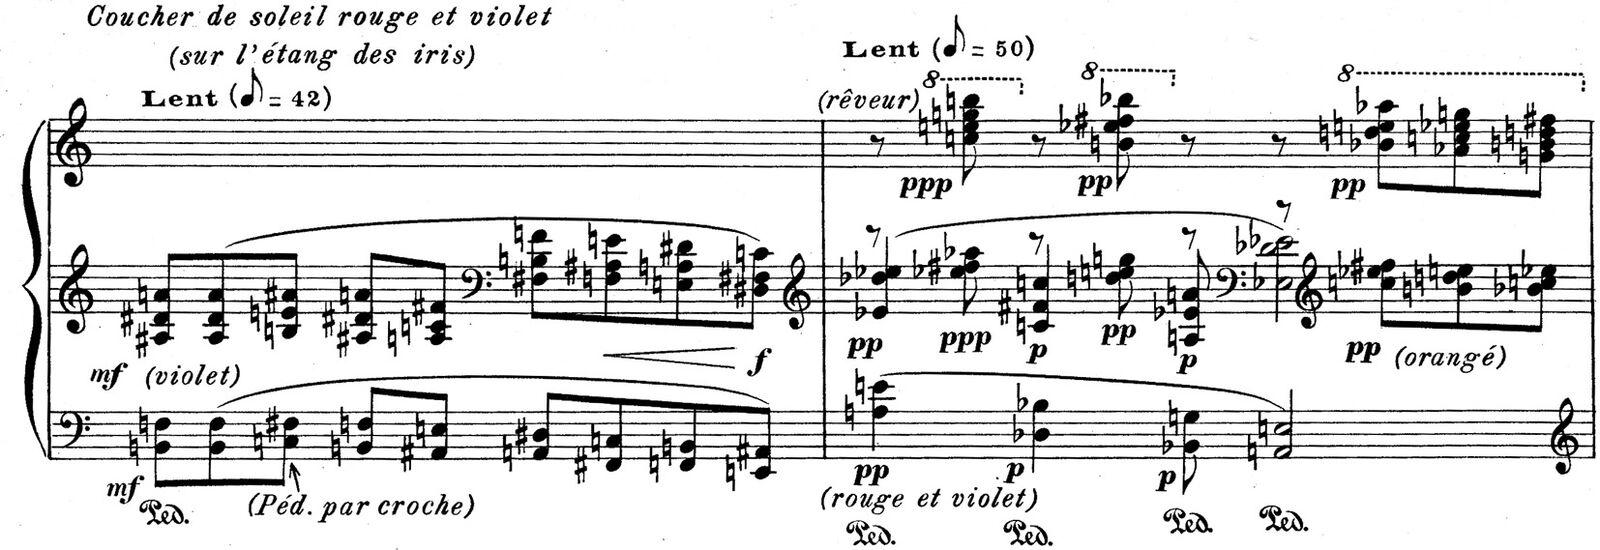 La Rousserolle Effarvatte Olivier Messiaen